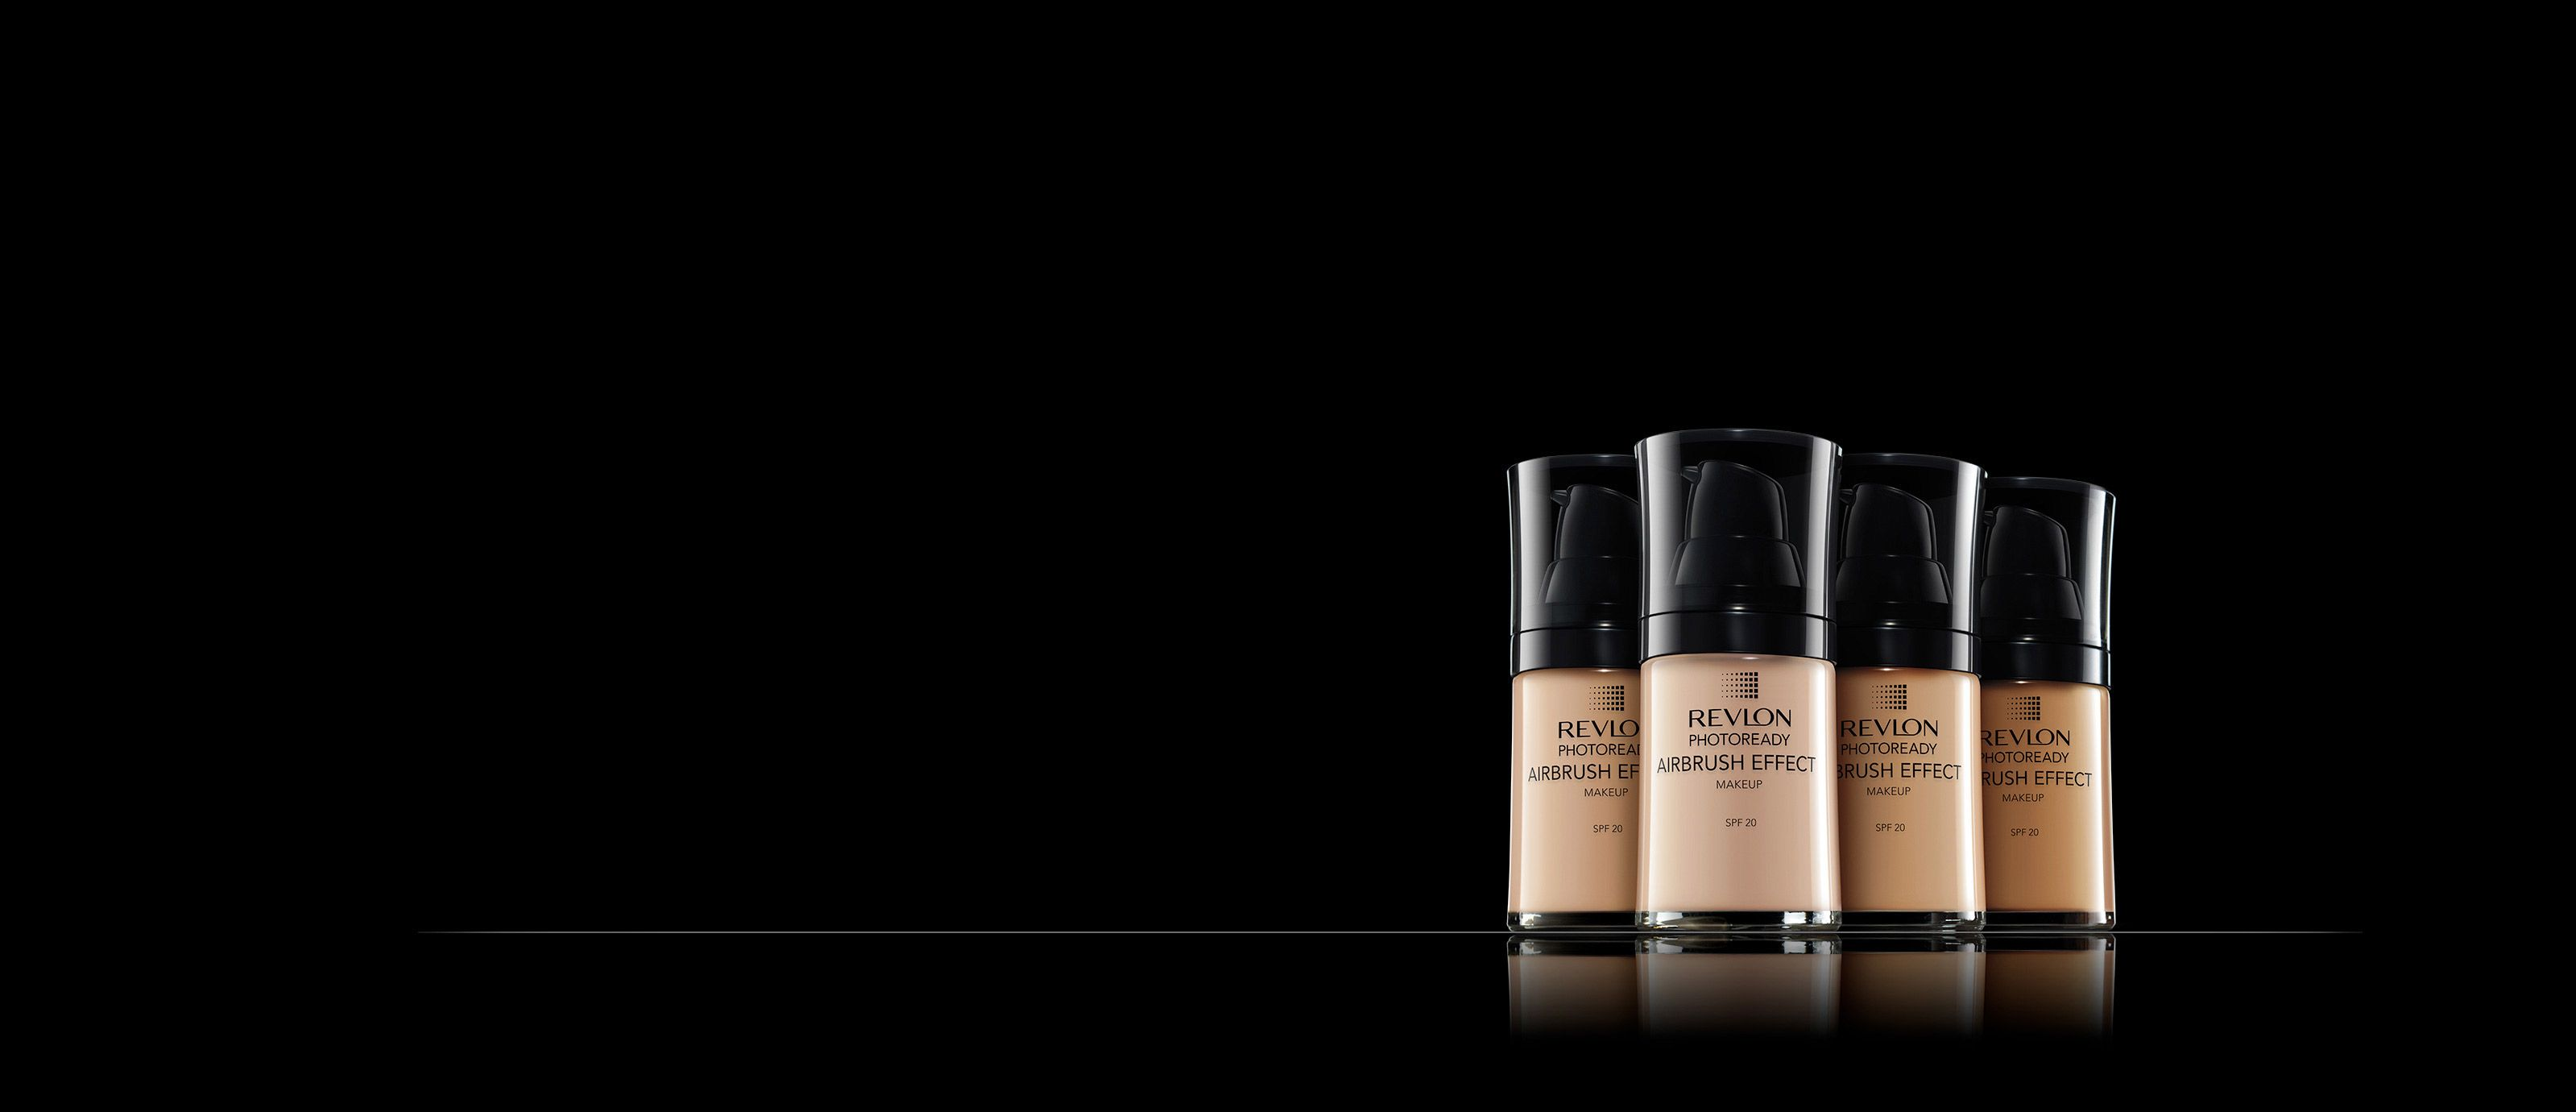 Revlon Photoready Airbrush Effect™ Makeup No foundation